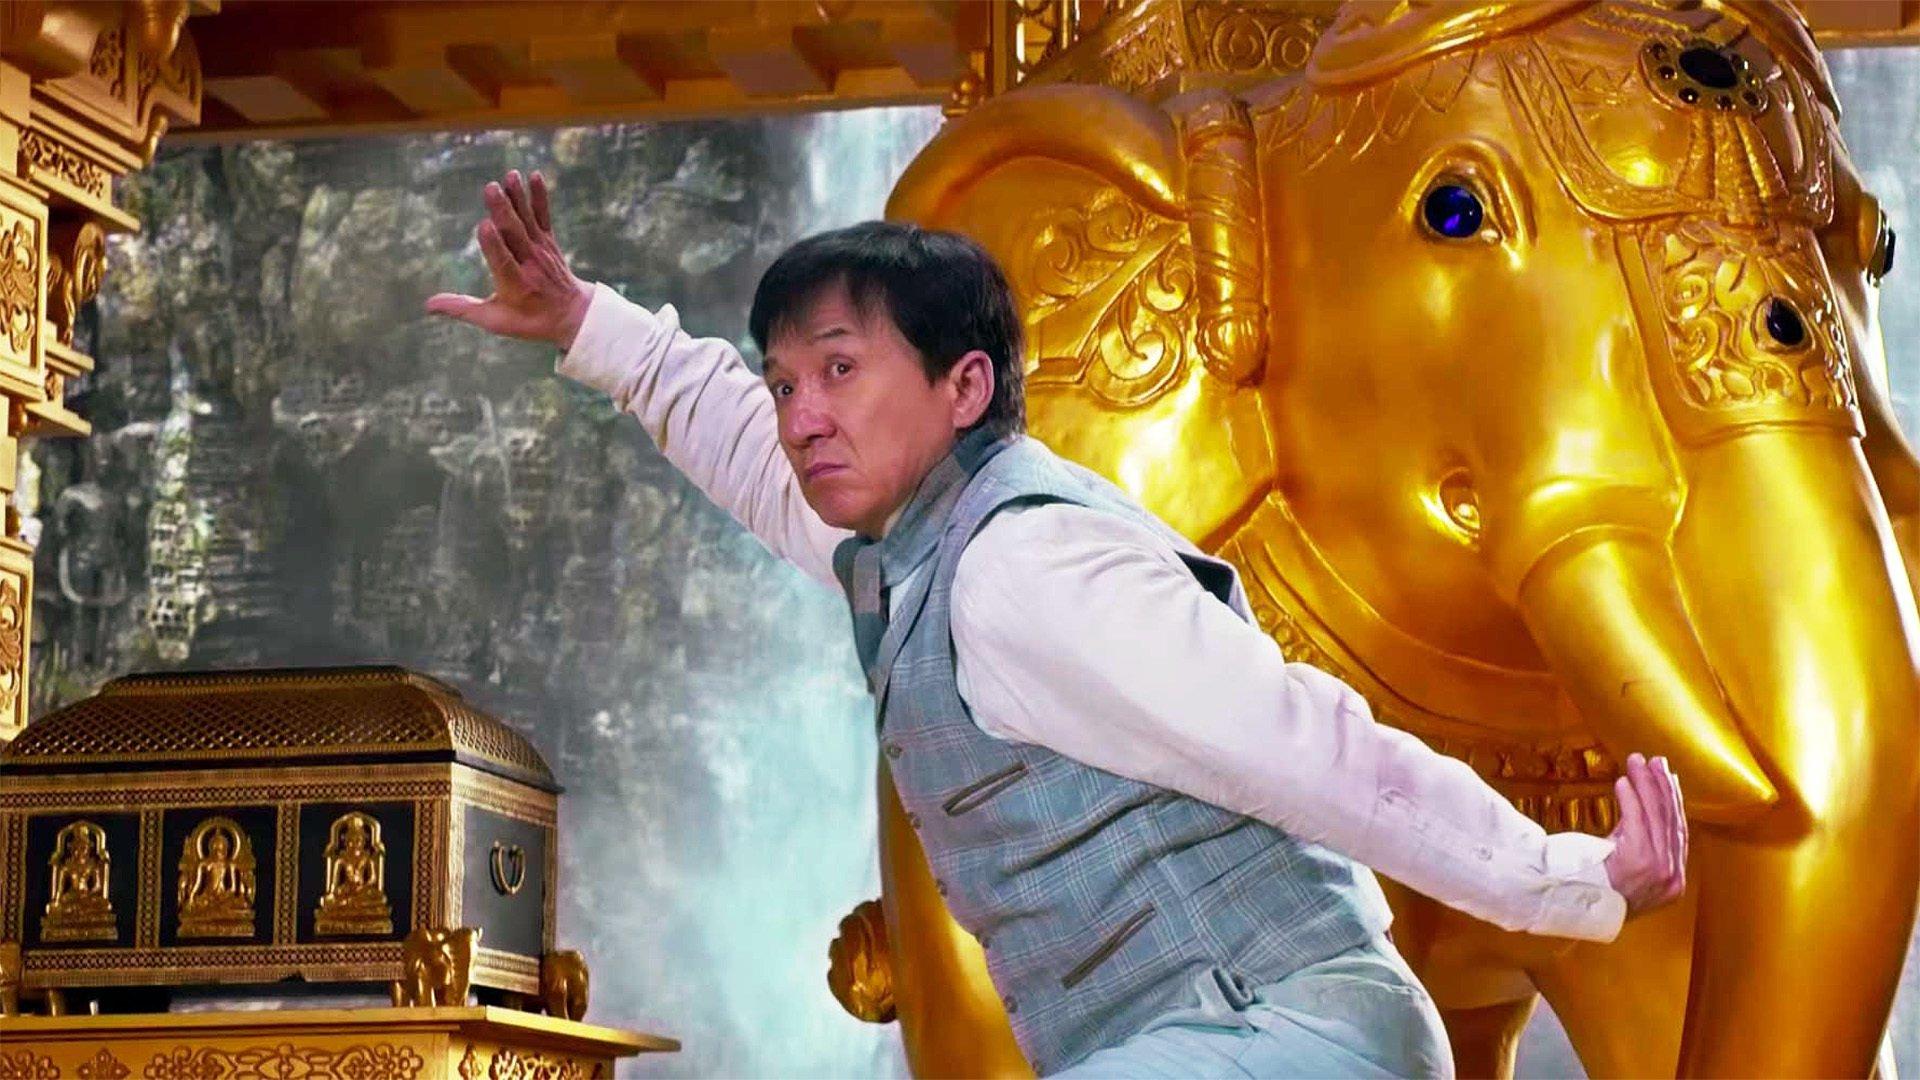 asiatico Kung fu porno